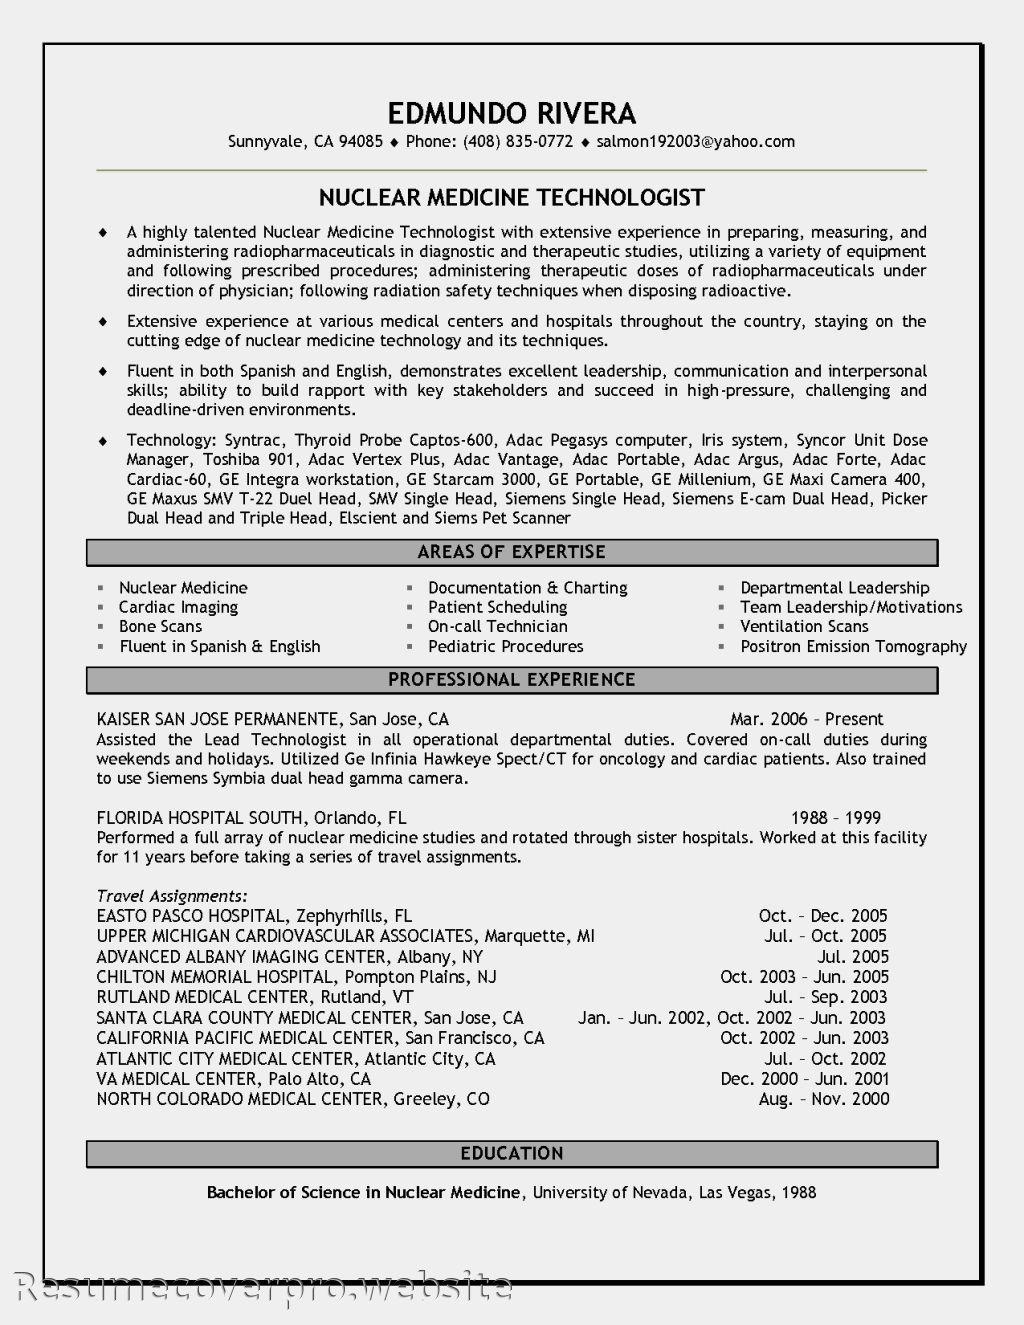 medical technologist microbiology resume sample nuclear medicine cover letter livecareer - Medical Technologist Resume Examples